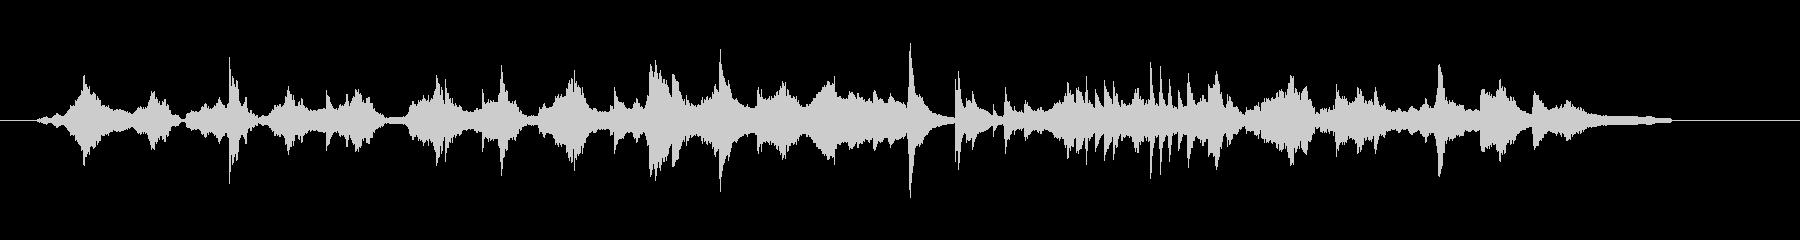 G Drone(「幸色のワンルーム」背景音楽)の未再生の波形